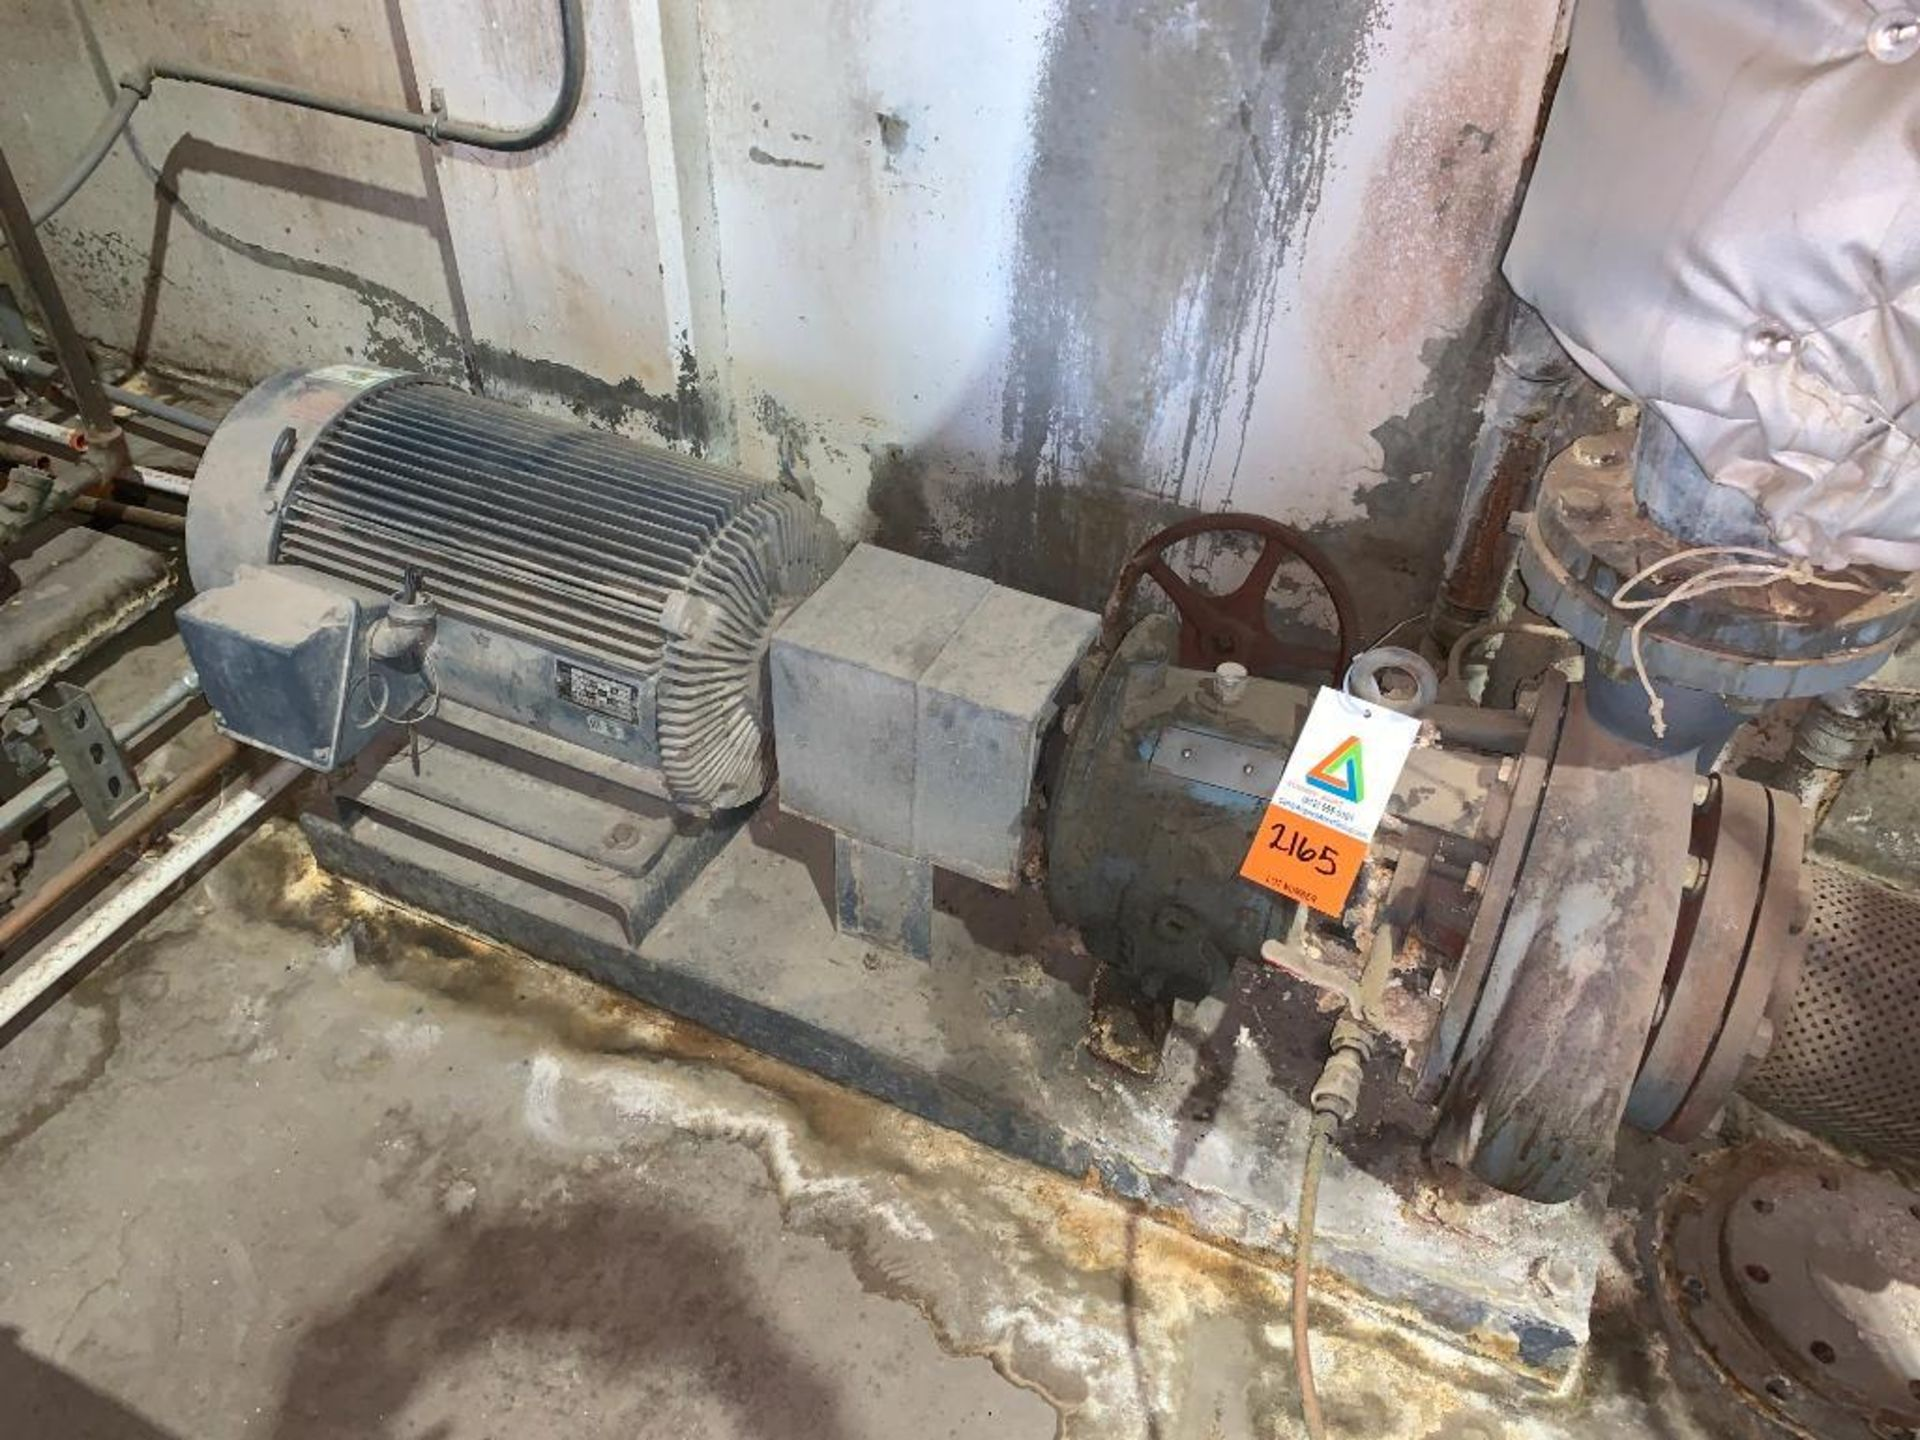 Ingersoll Dresser high temperature water pump - Image 4 of 5